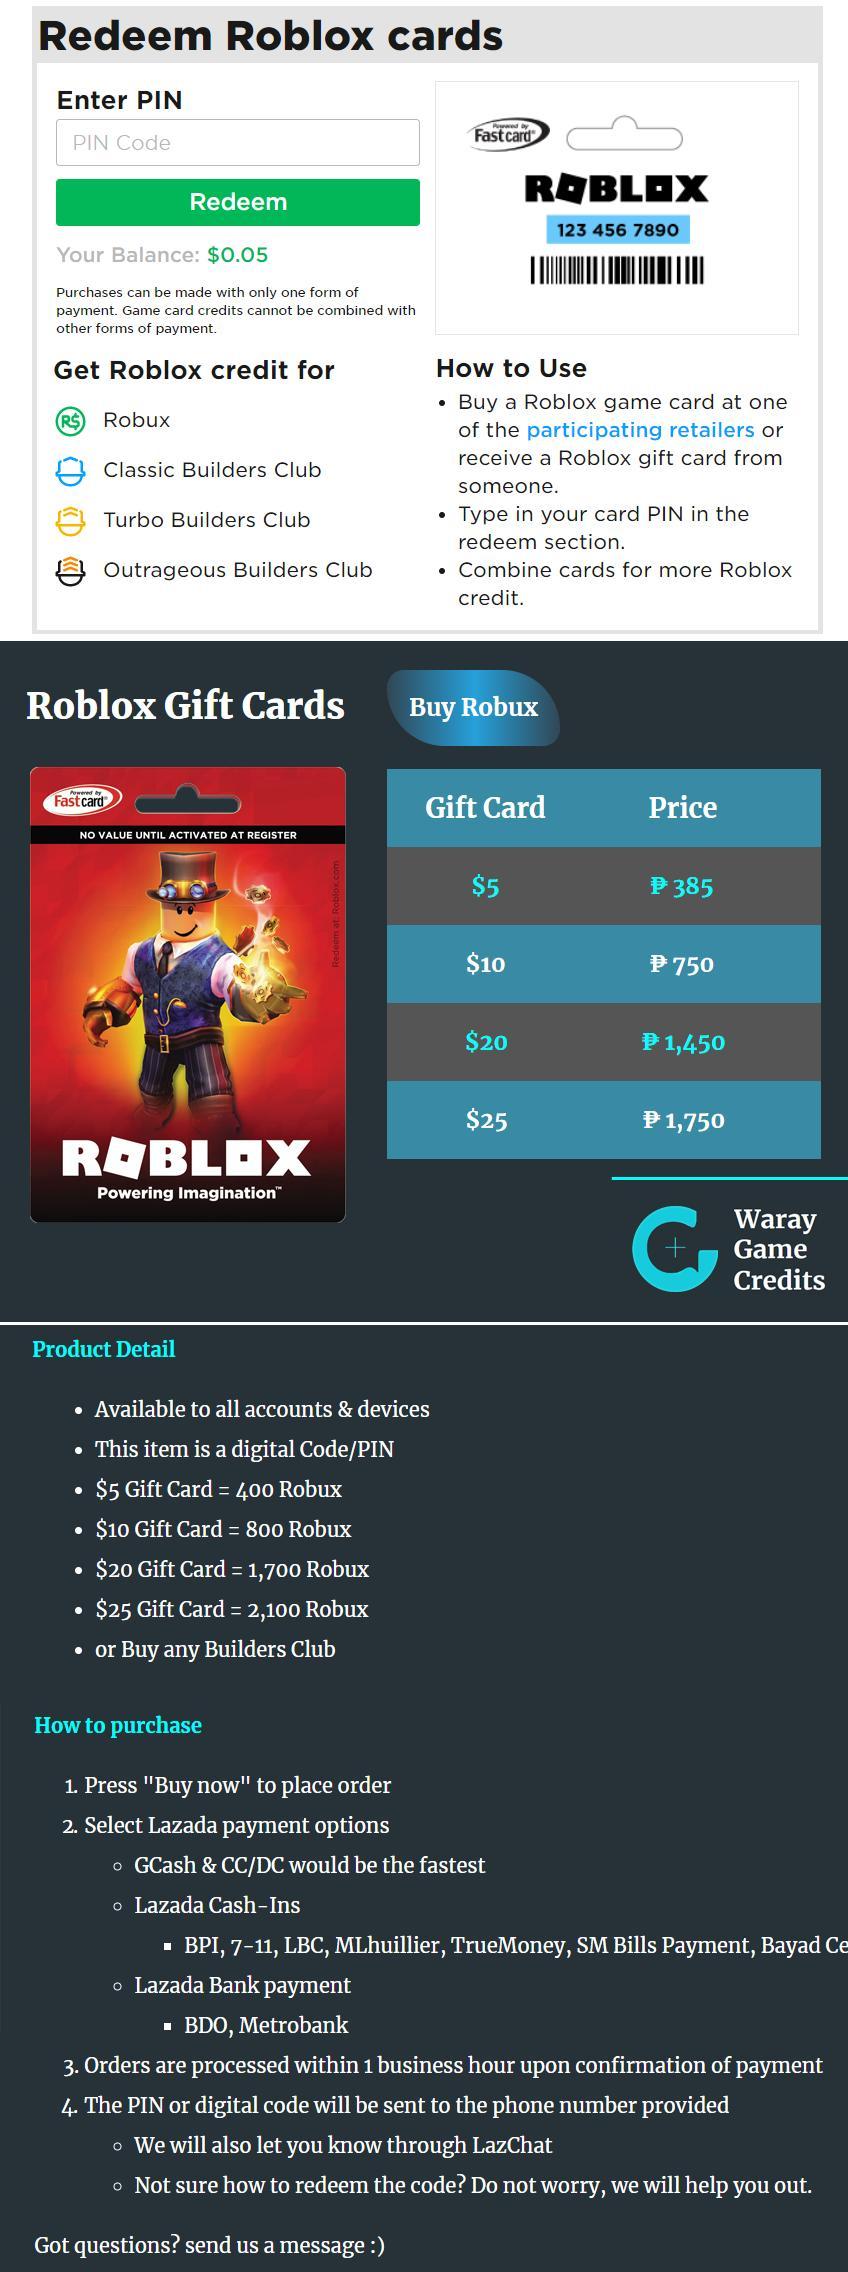 $10 Roblox Gift Card (800 R$)